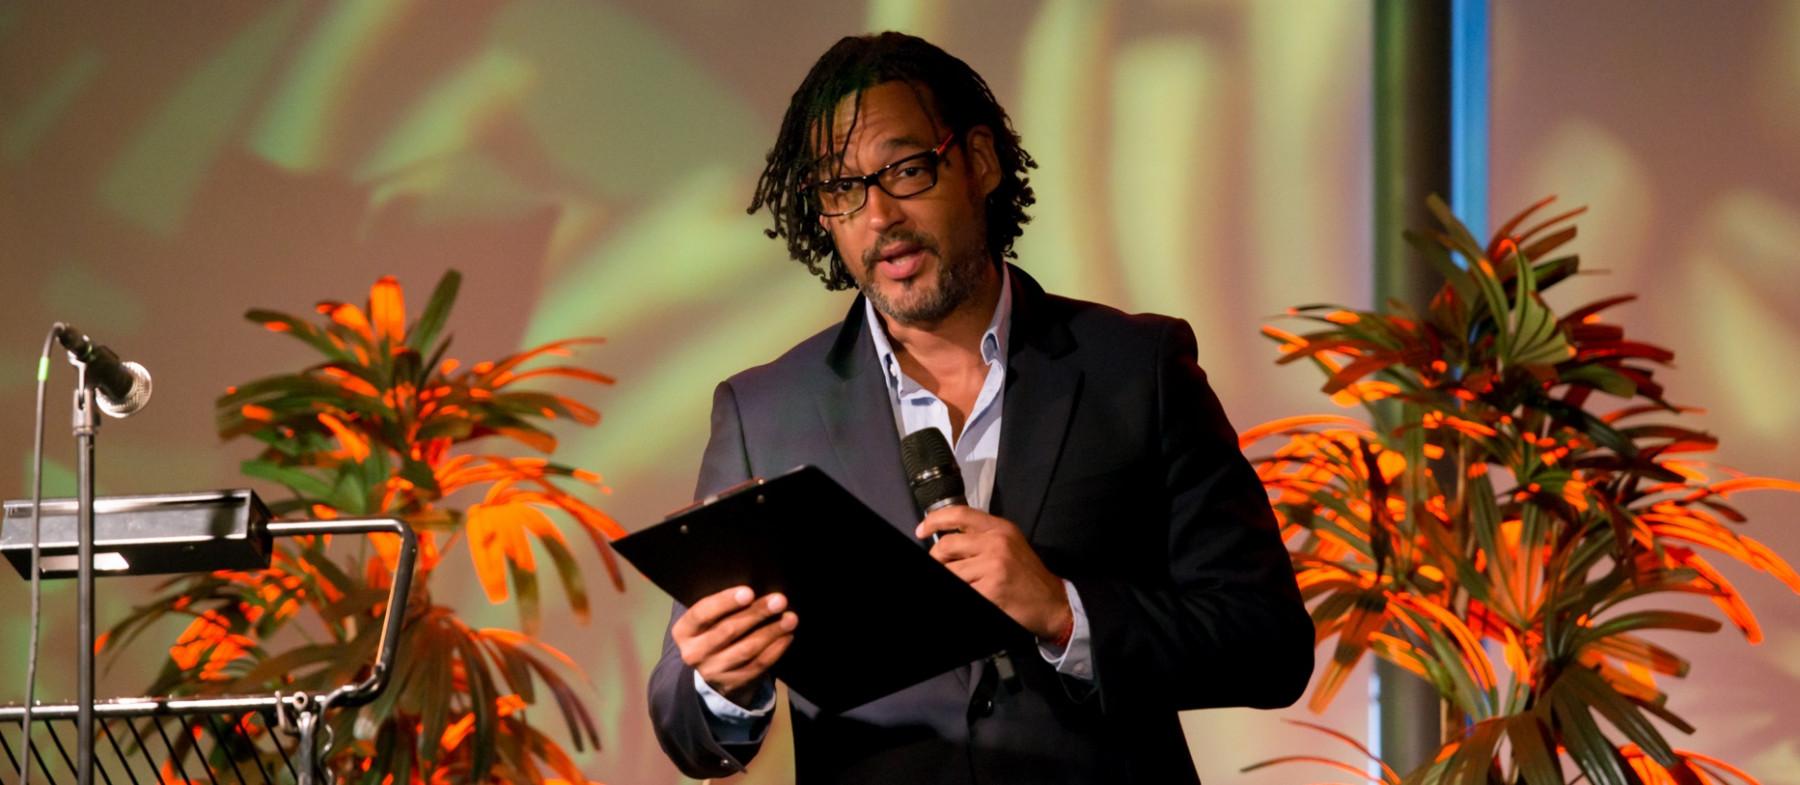 Image of historian, producer and broadcaster David Olusoga